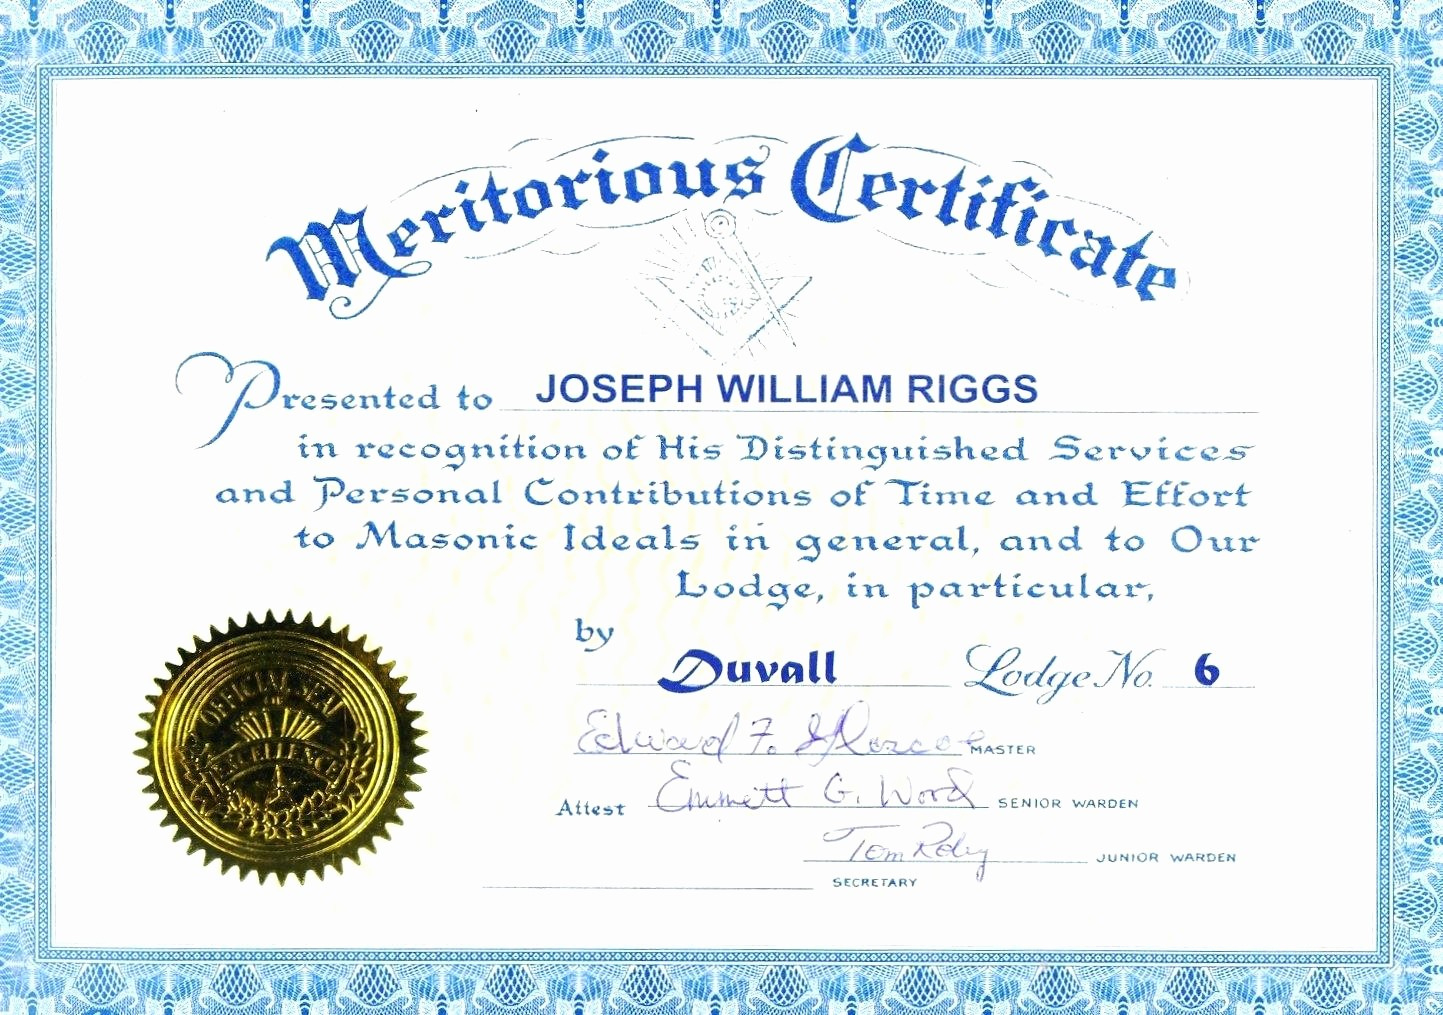 50 Employee Of The Year Certificates  Ufreeonline Template regarding Quality Employee Of The Year Certificate Template Free